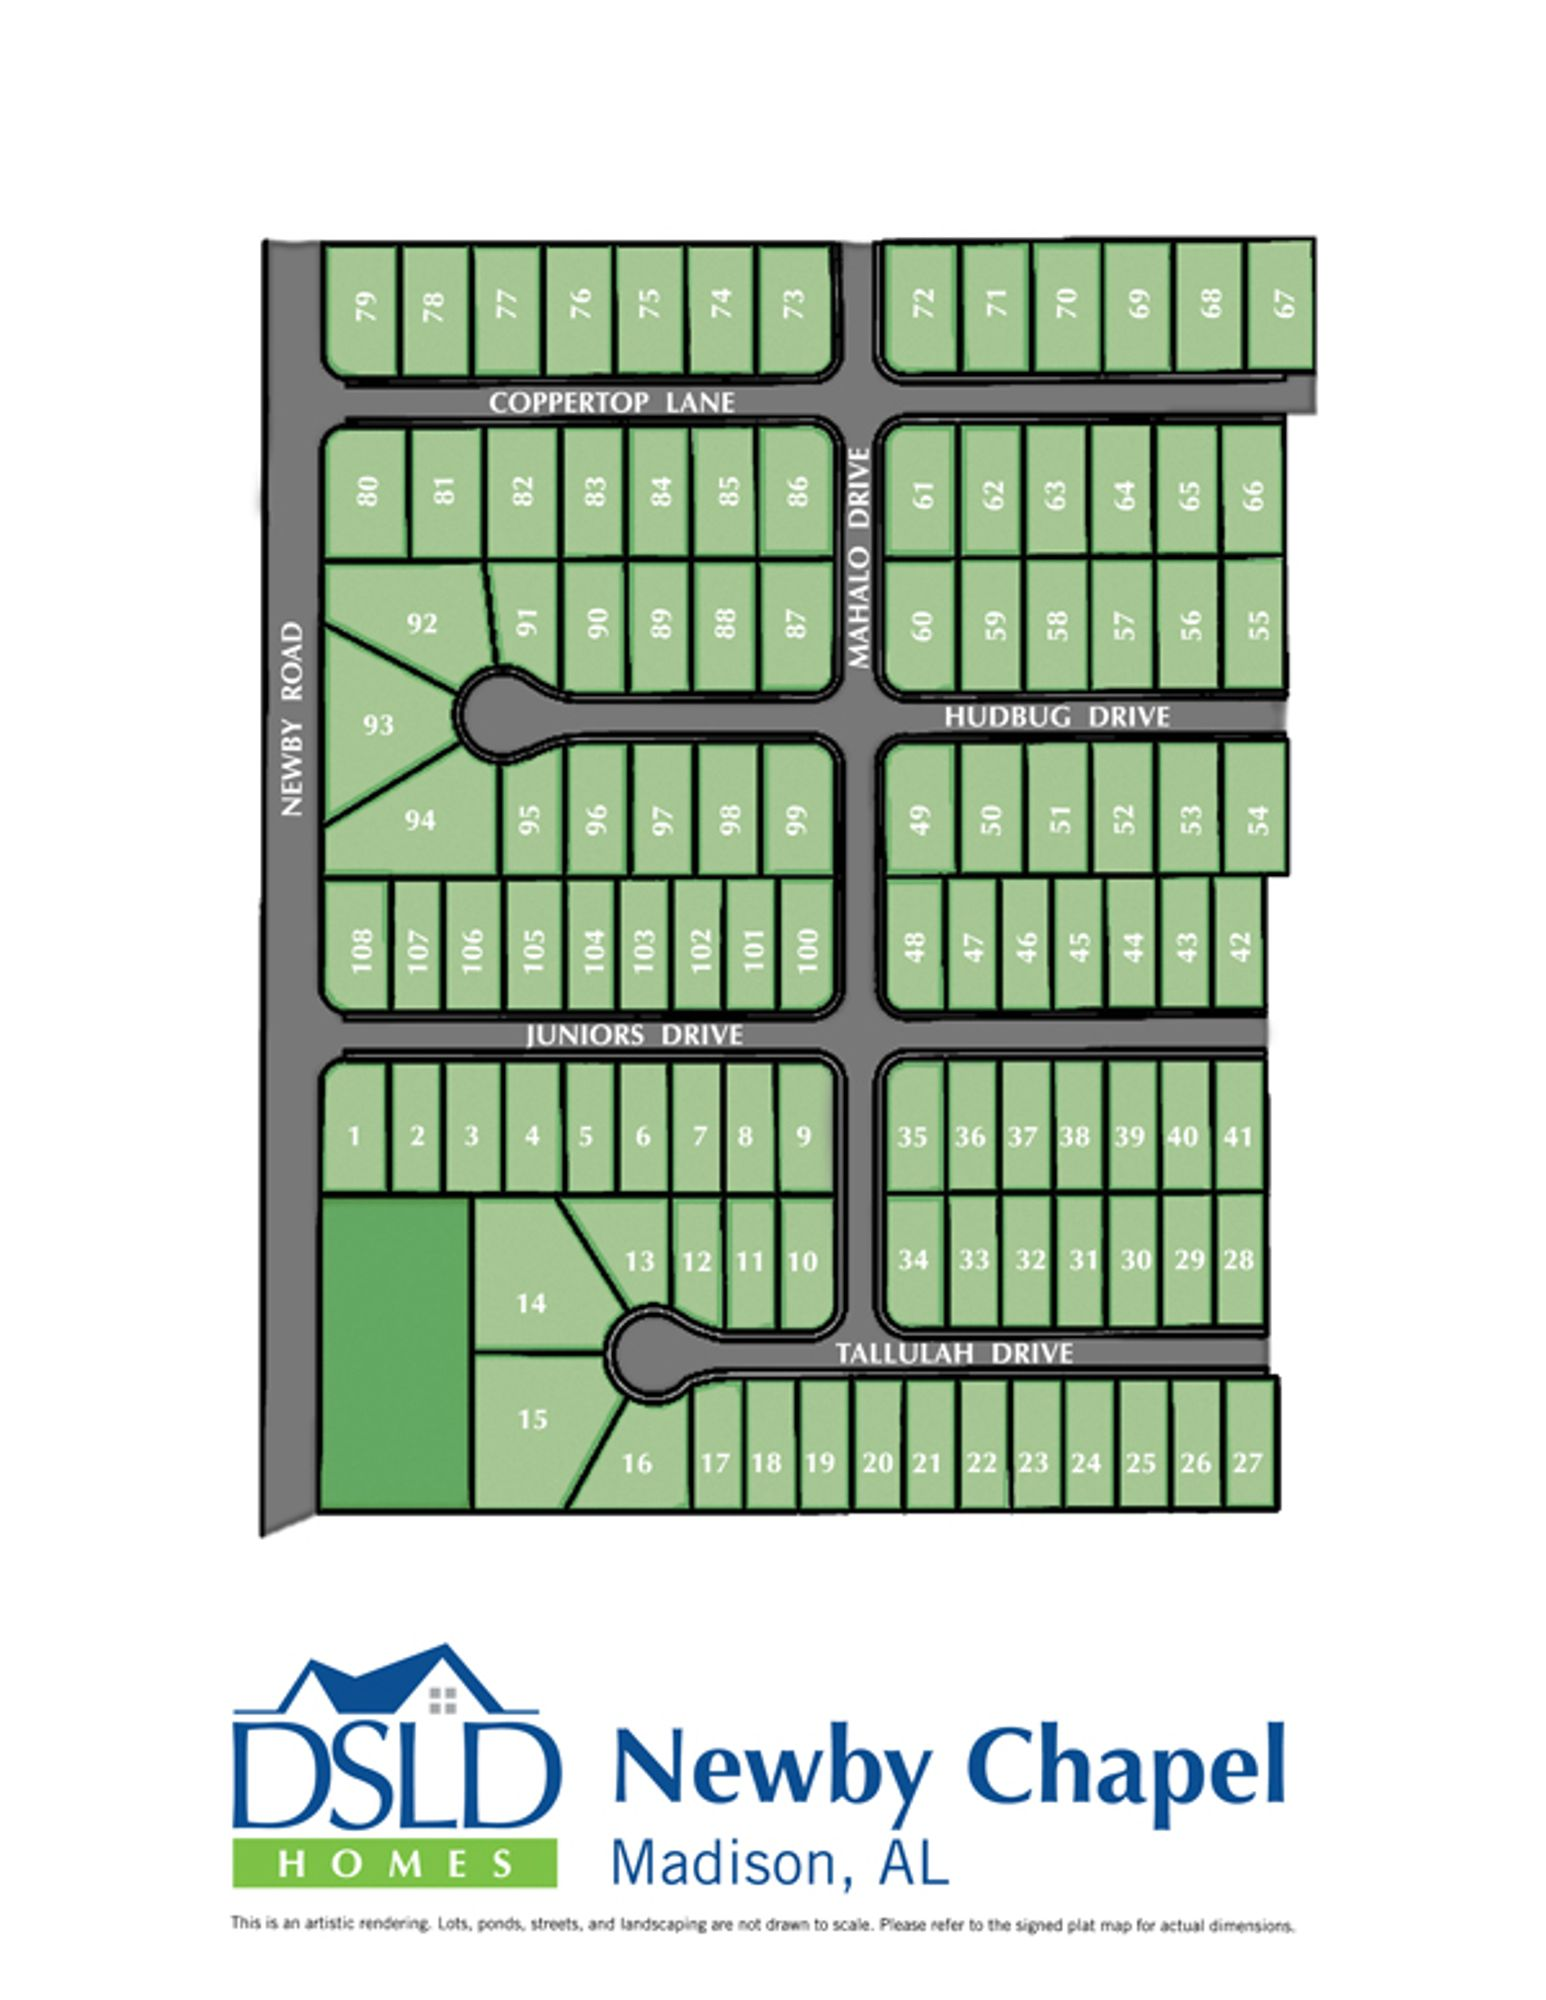 Newby Chapel